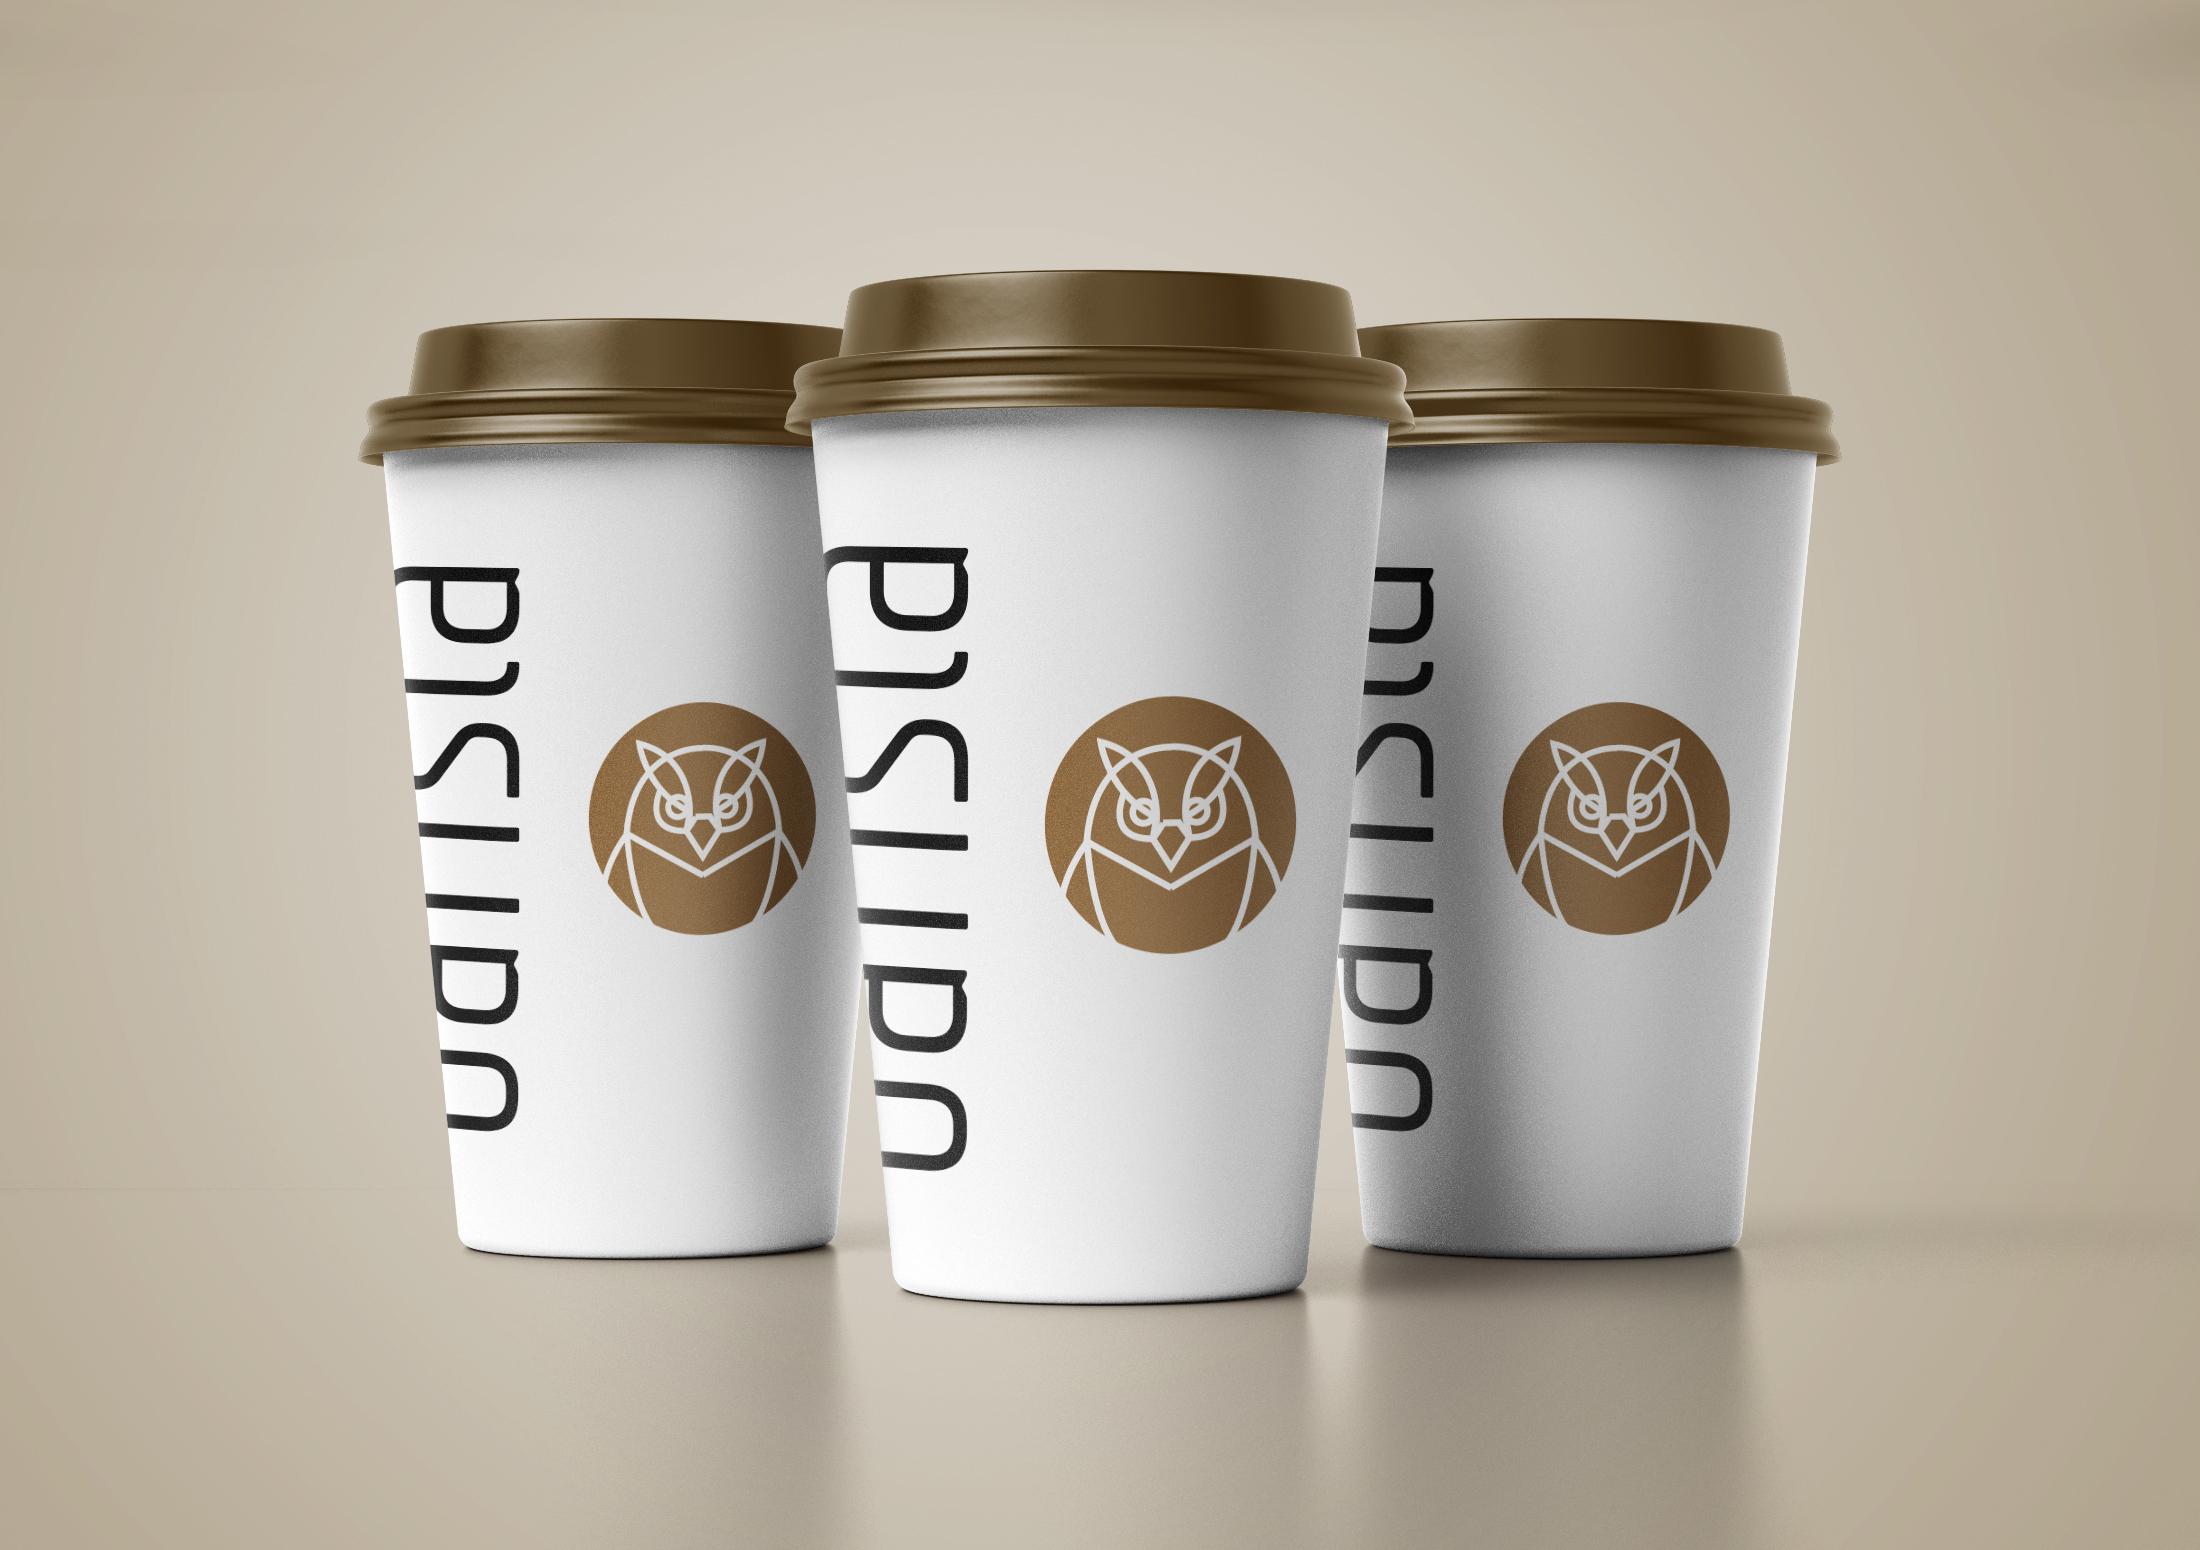 Ребрендинг логотипа сети кофеен фото f_4615e7cdc54b3d49.jpg